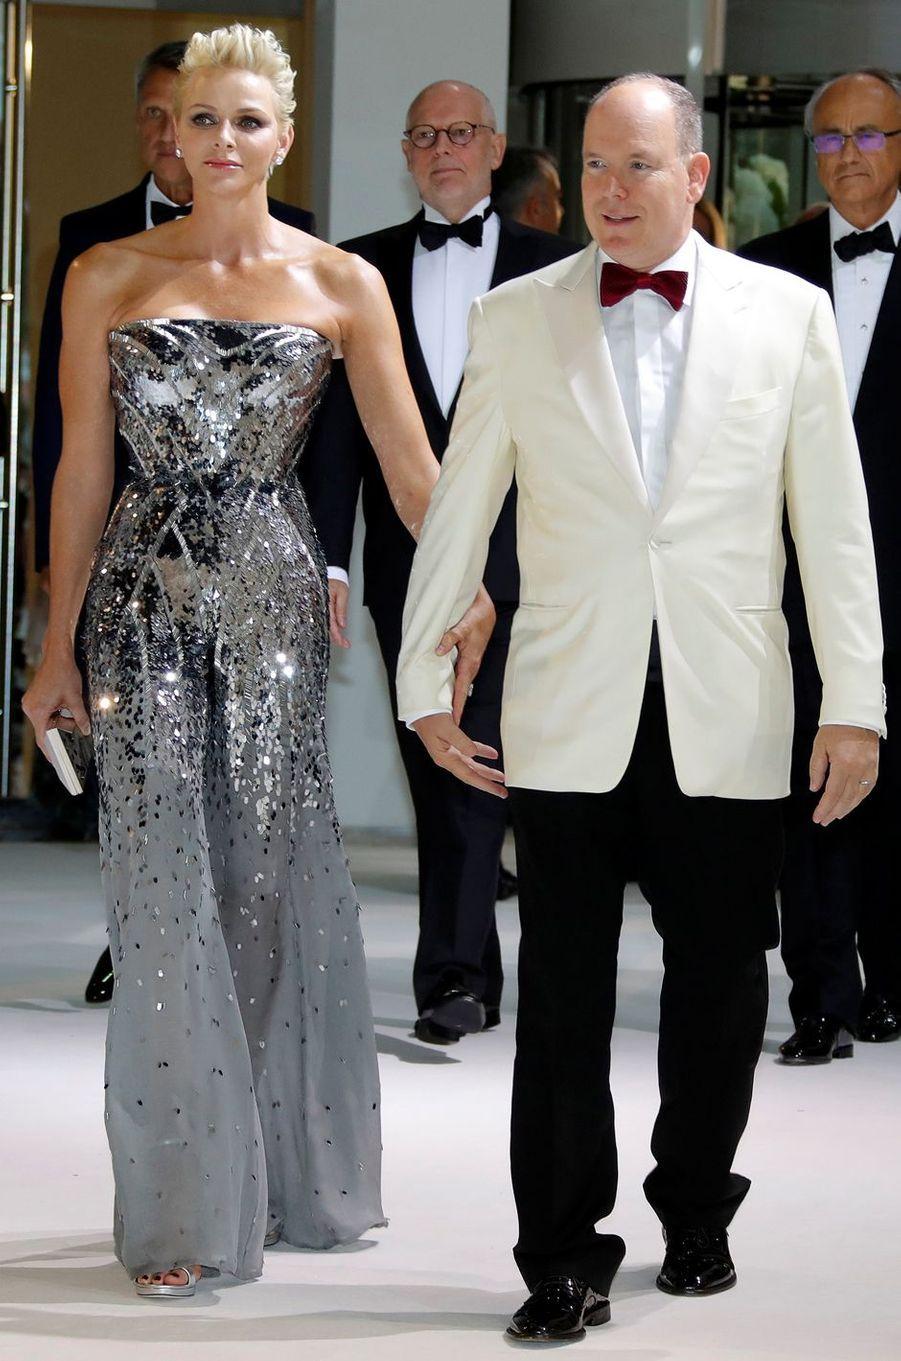 La princesse Charlène de Monaco en Atelier Versace, le 28 juillet 2017